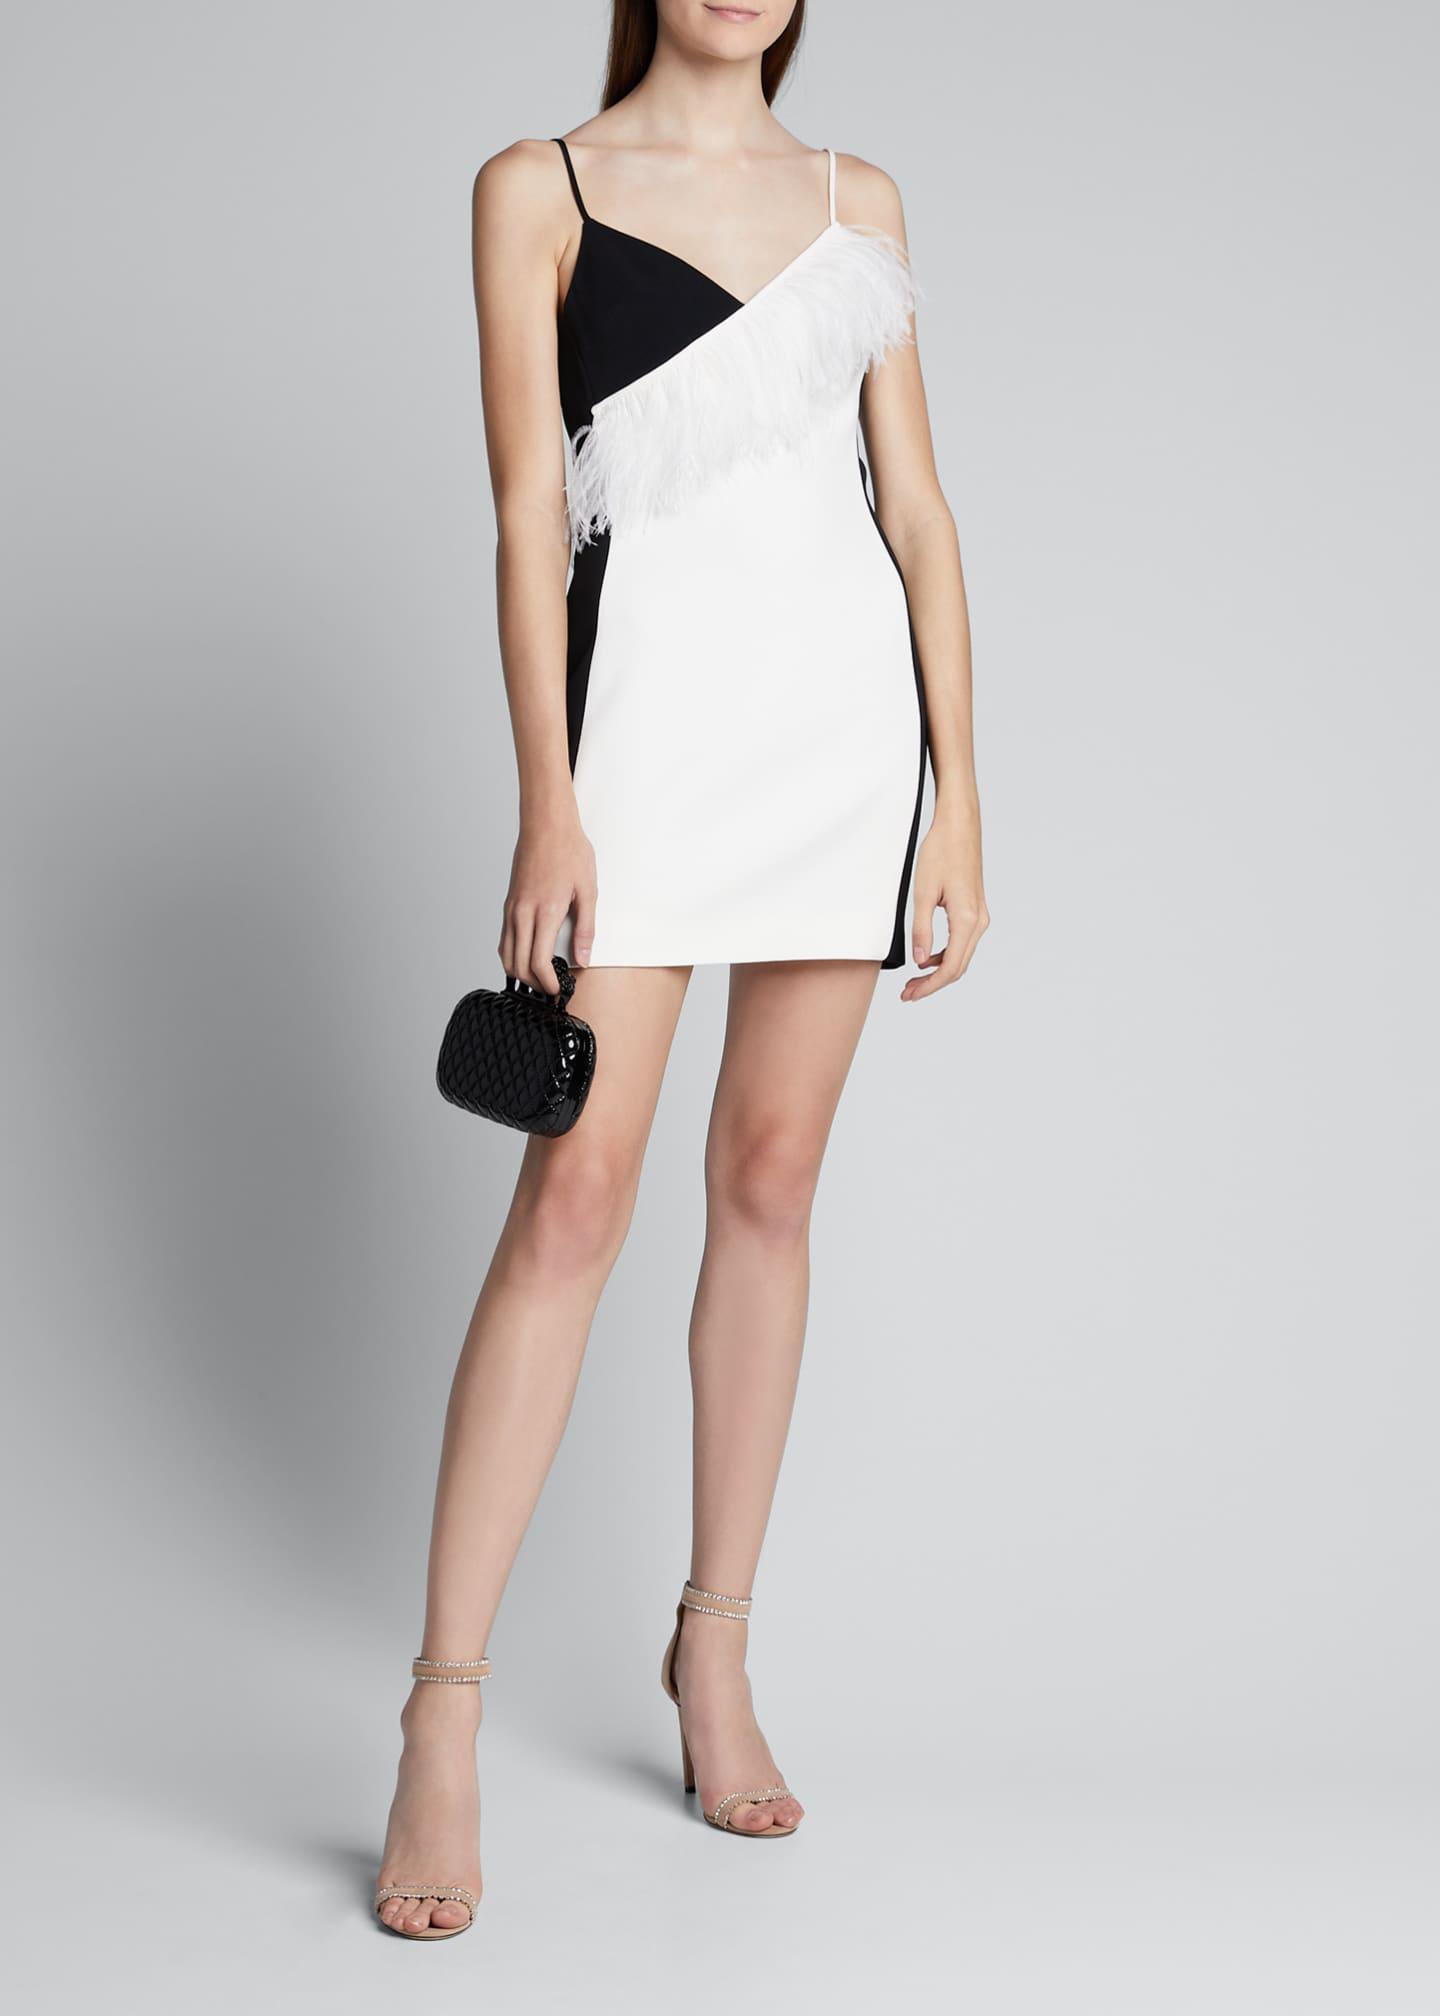 David Koma Feather-Trim Sleeveless Mini Dress